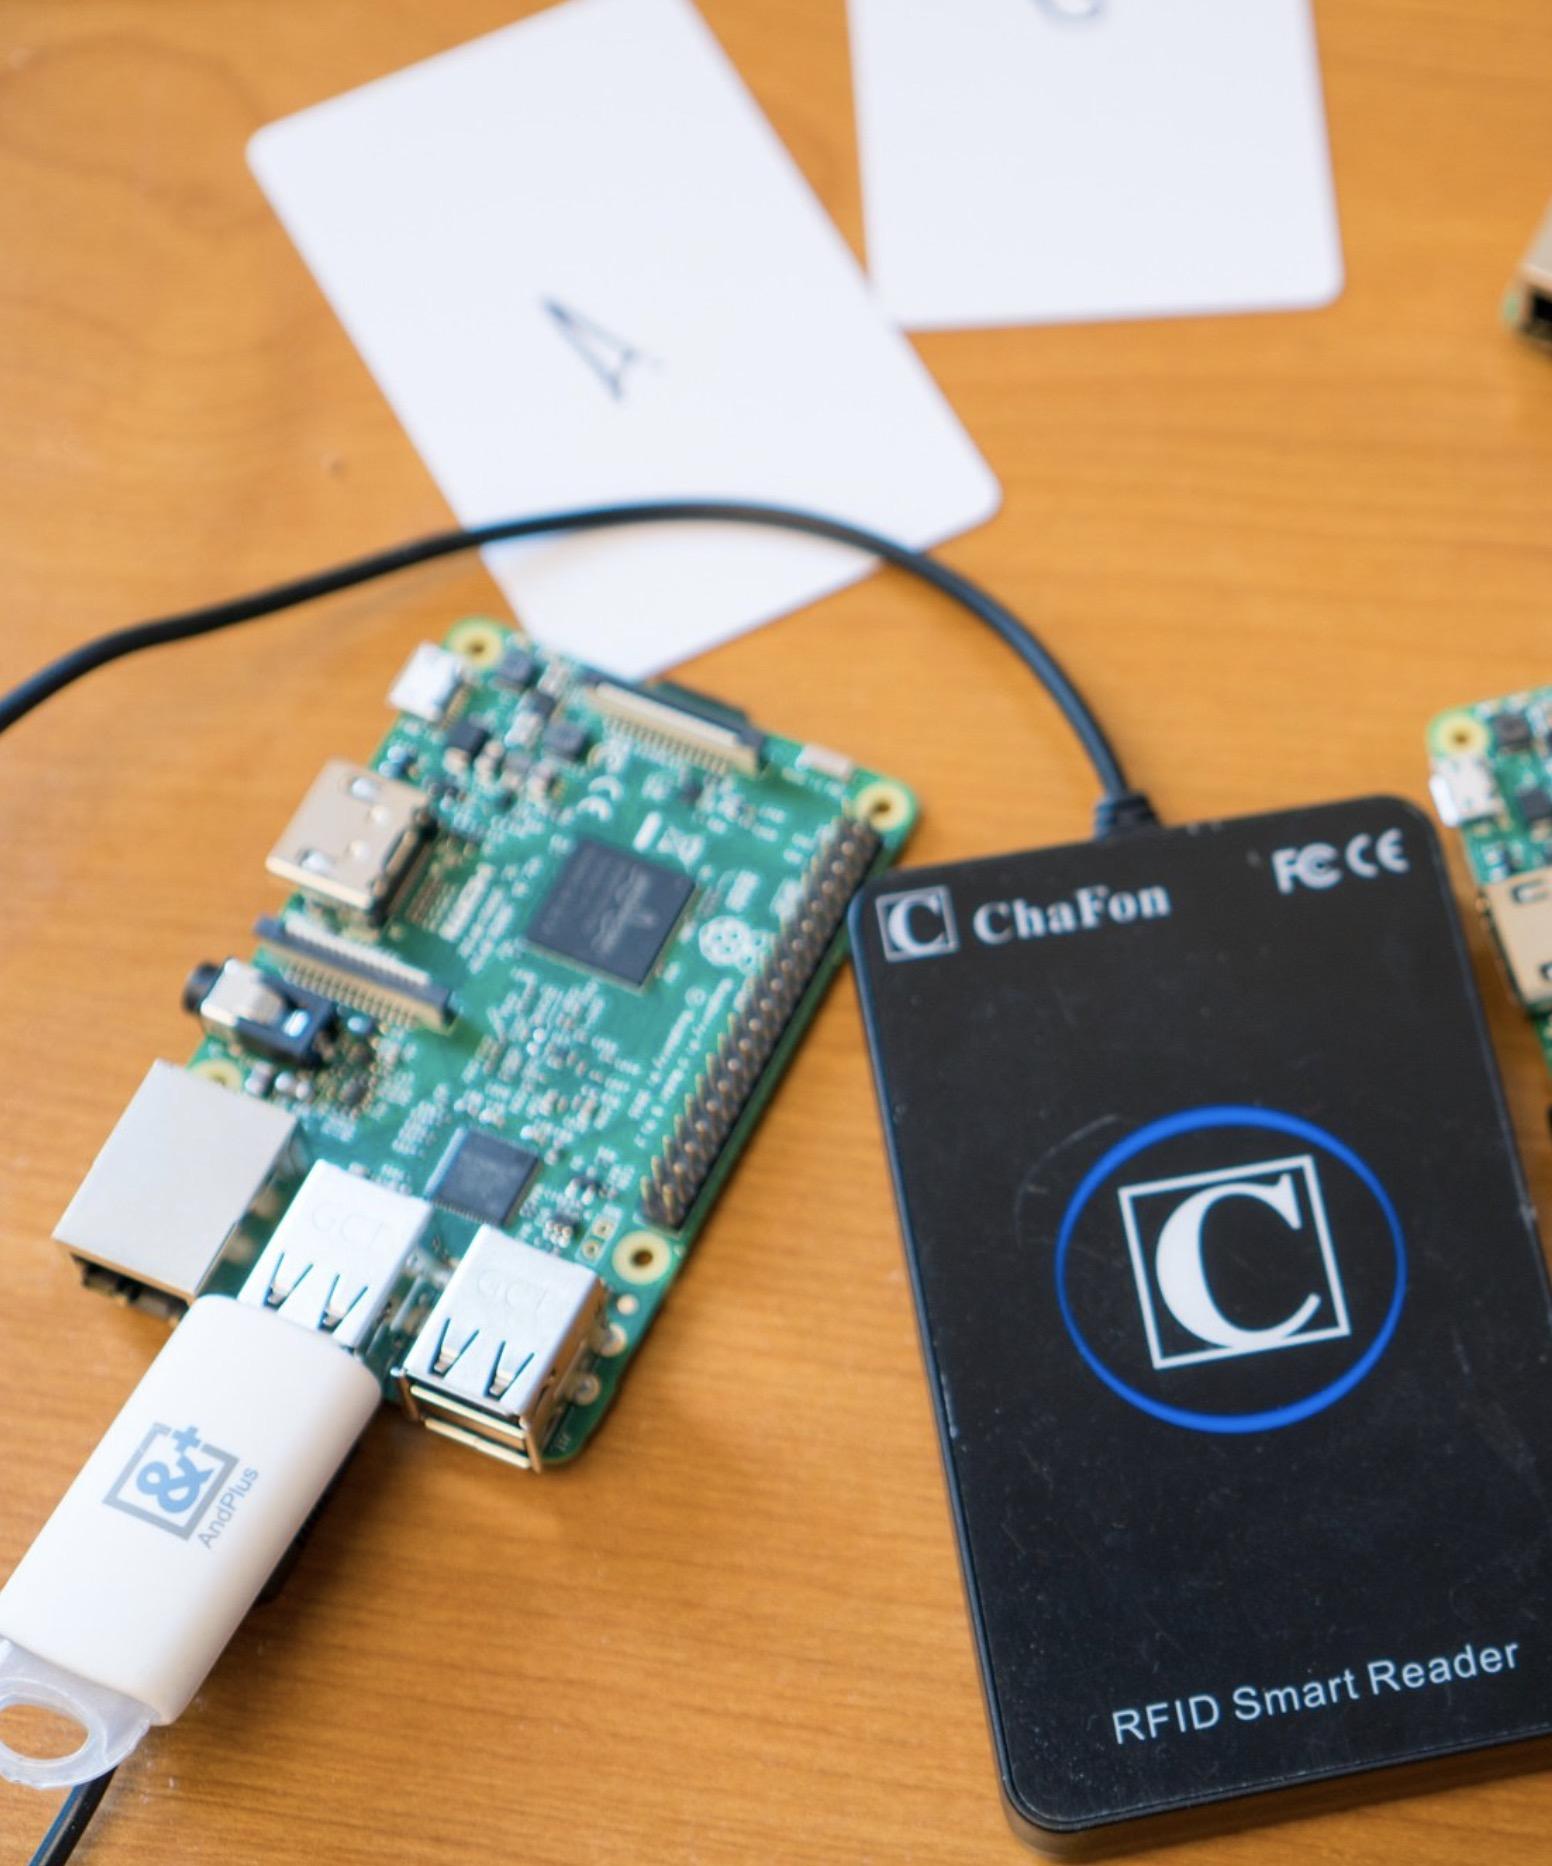 RFID blockchain proof of concept application